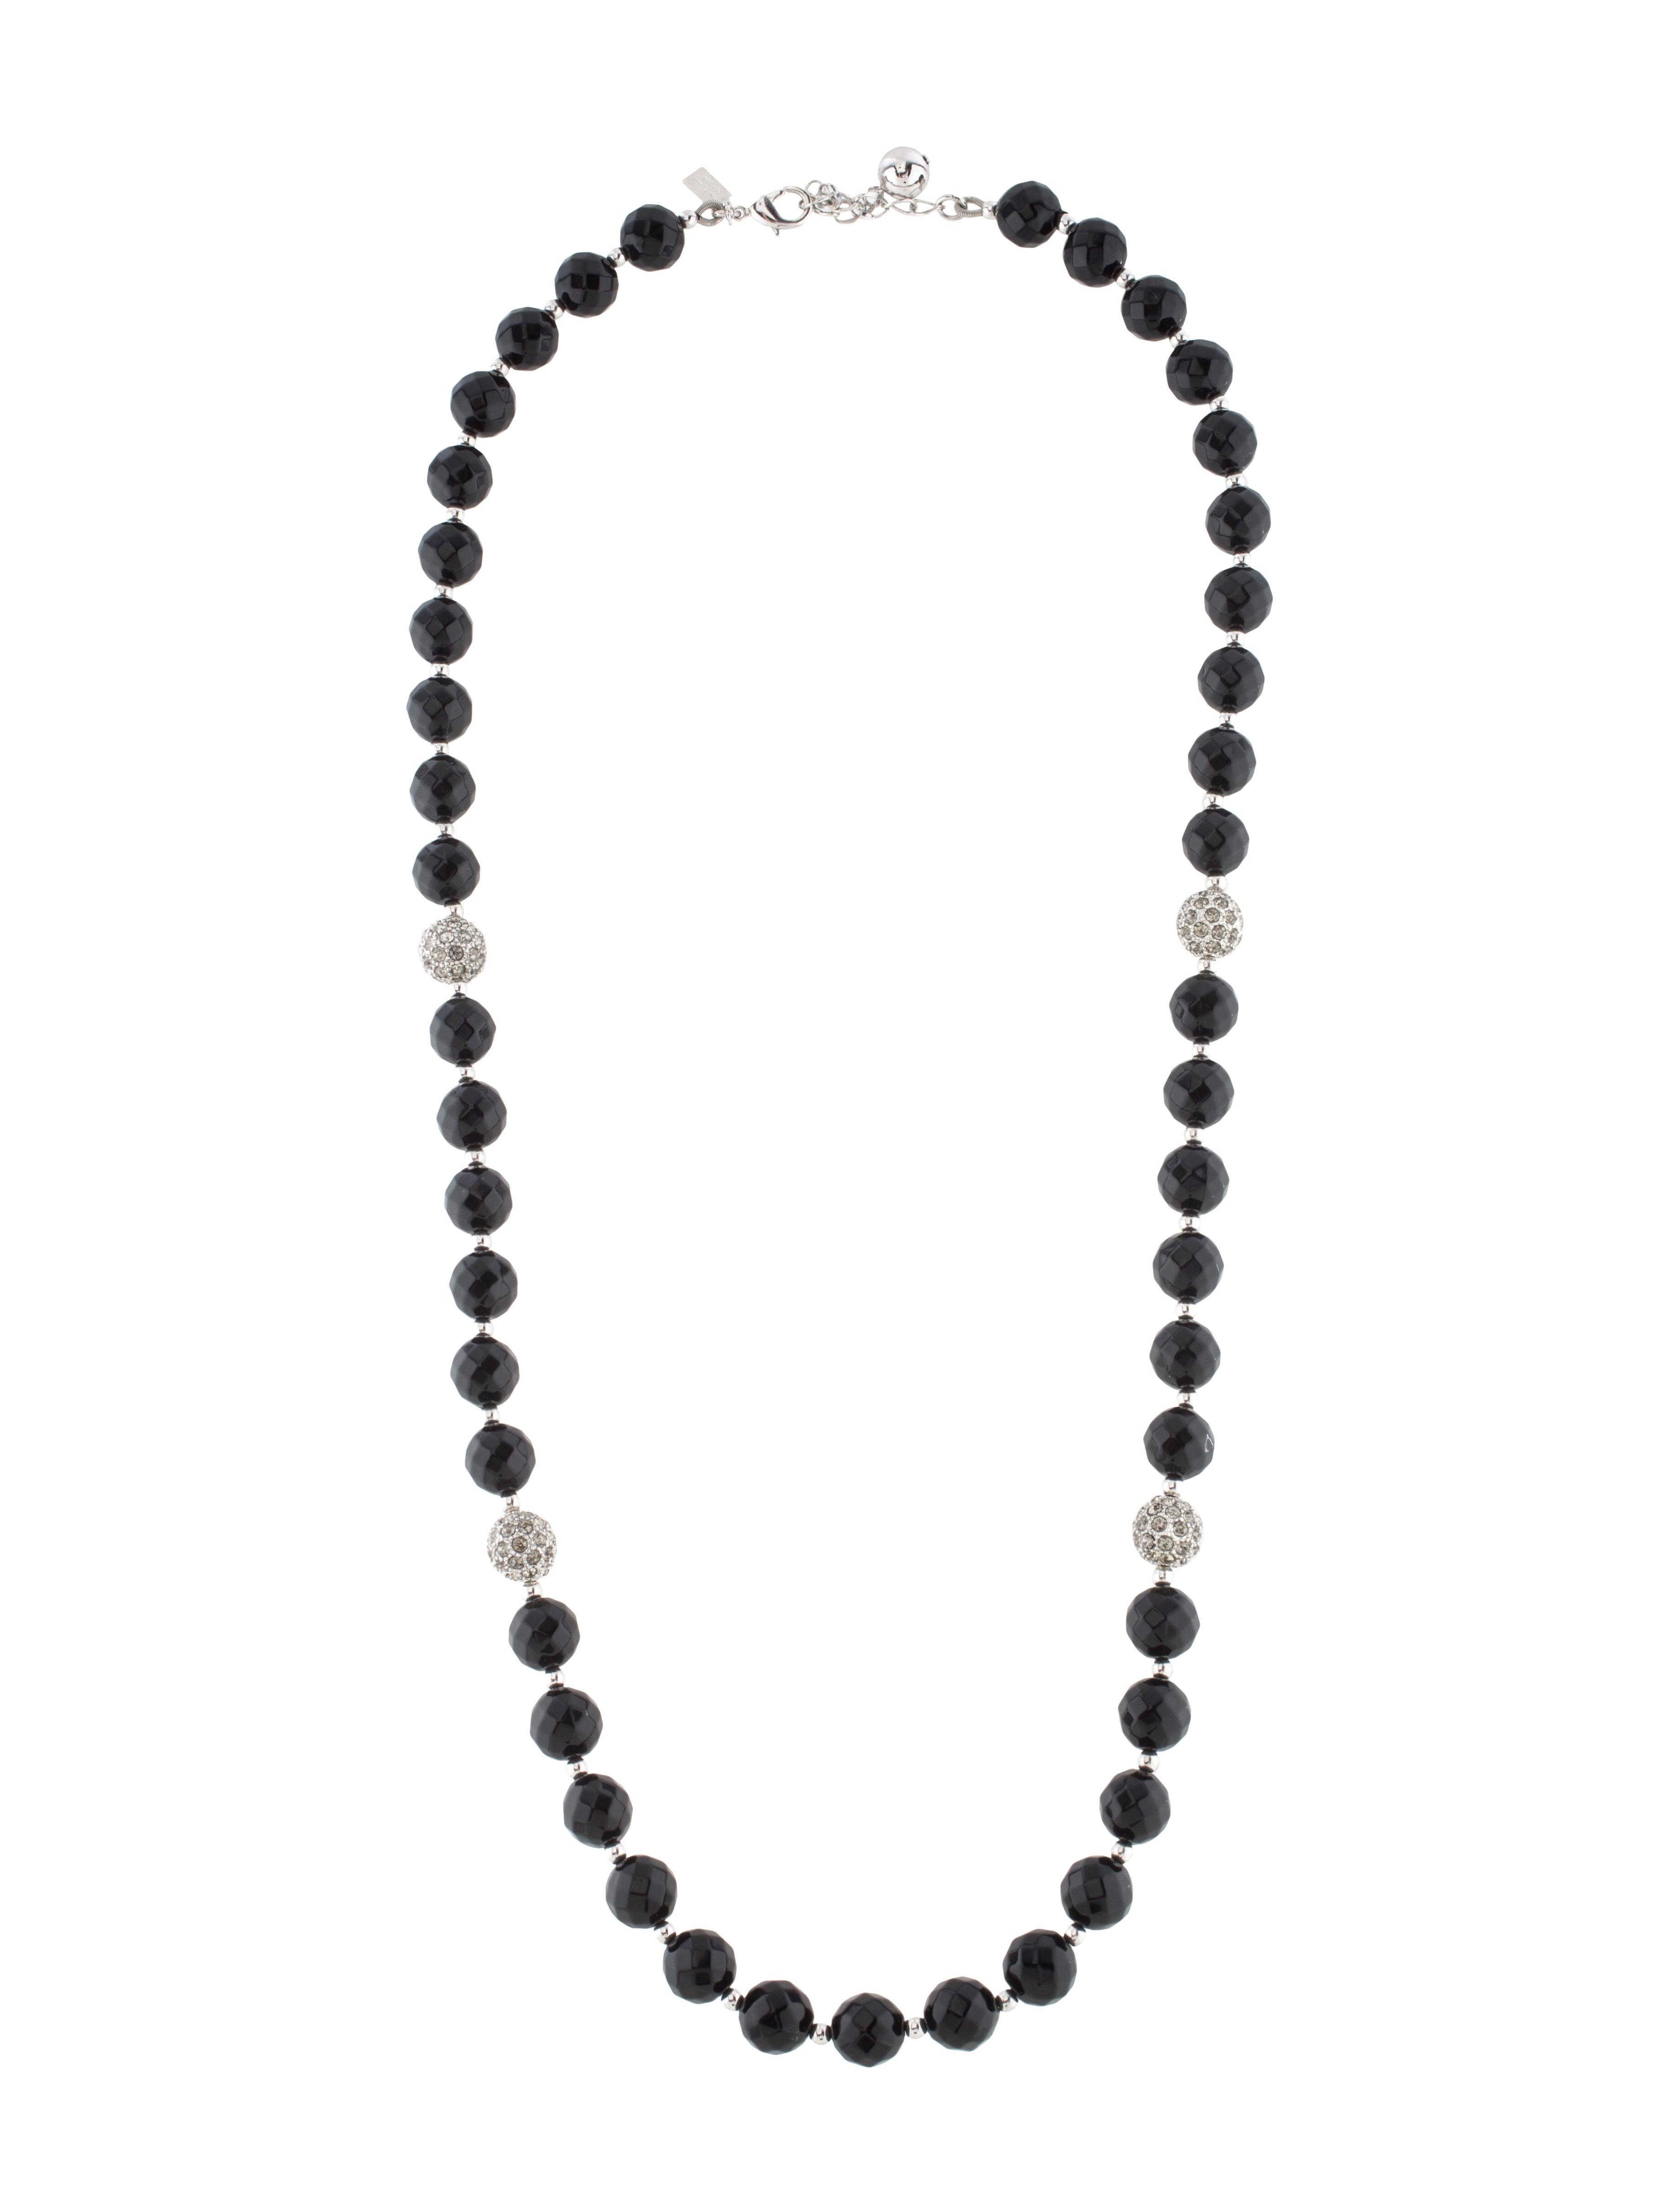 kate spade new york bead crystal necklace necklaces. Black Bedroom Furniture Sets. Home Design Ideas